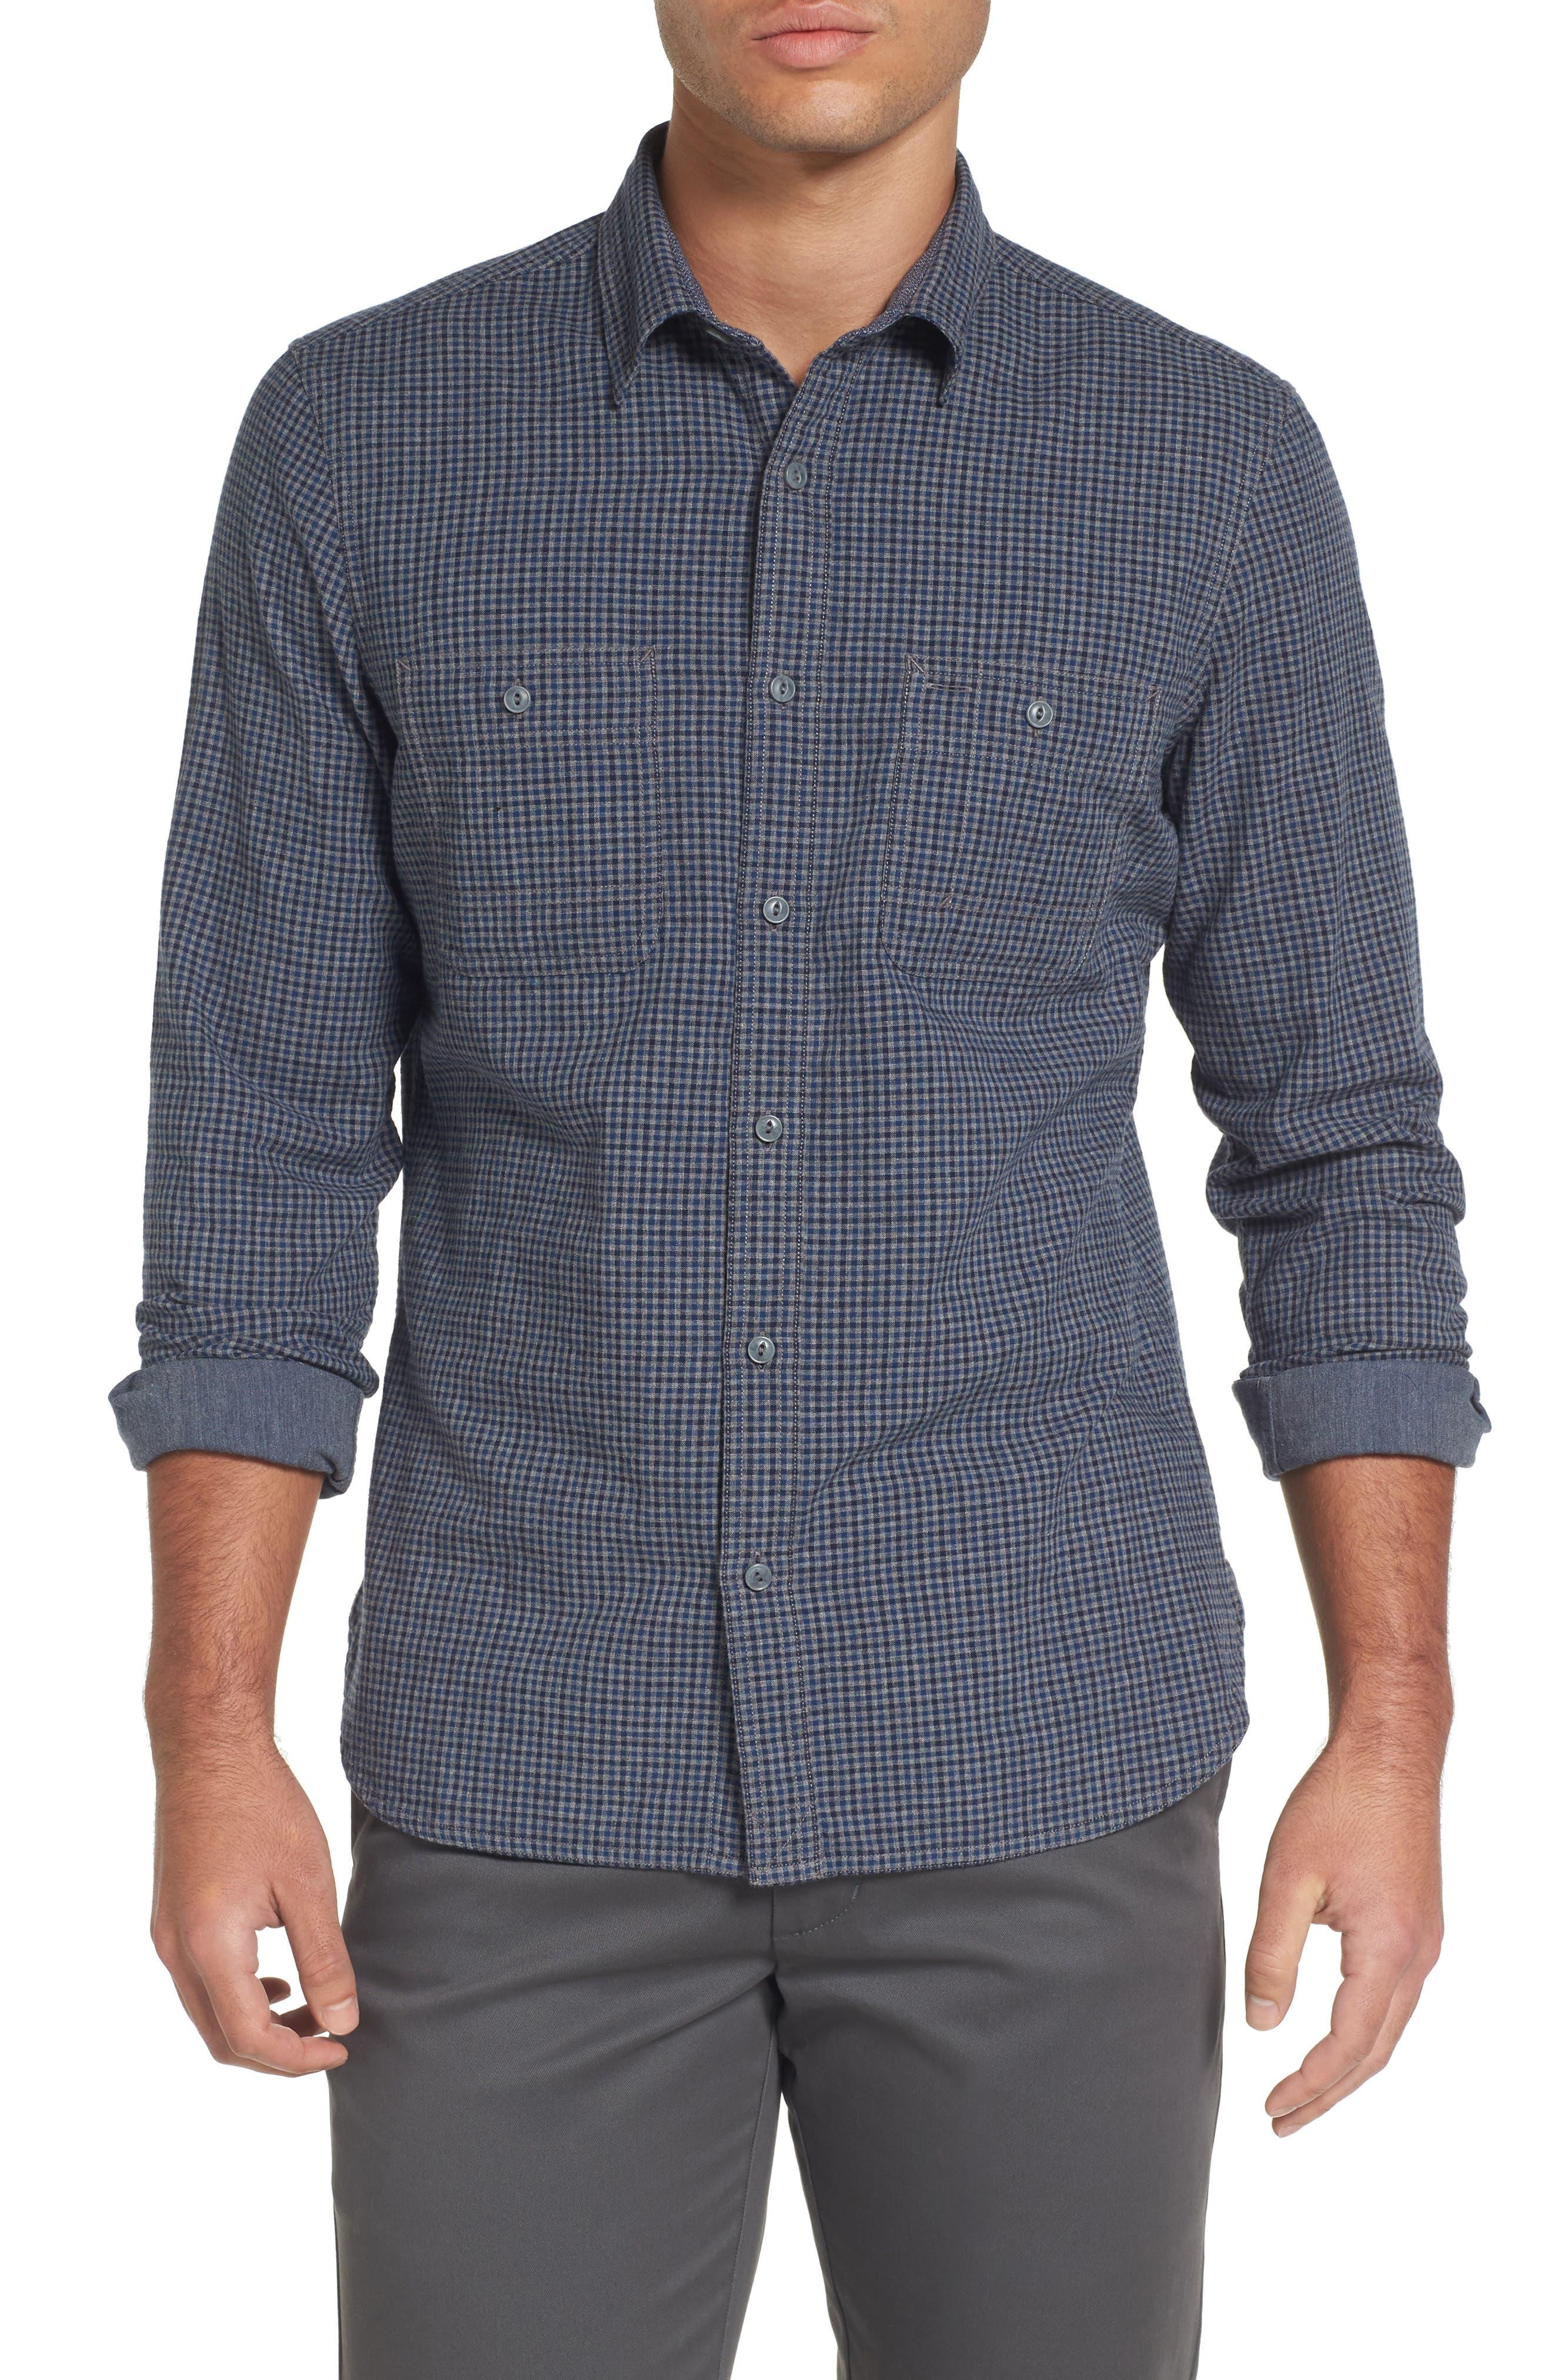 Nordstrom Men's Shop Slim Fit Micro Check Sport Shirt